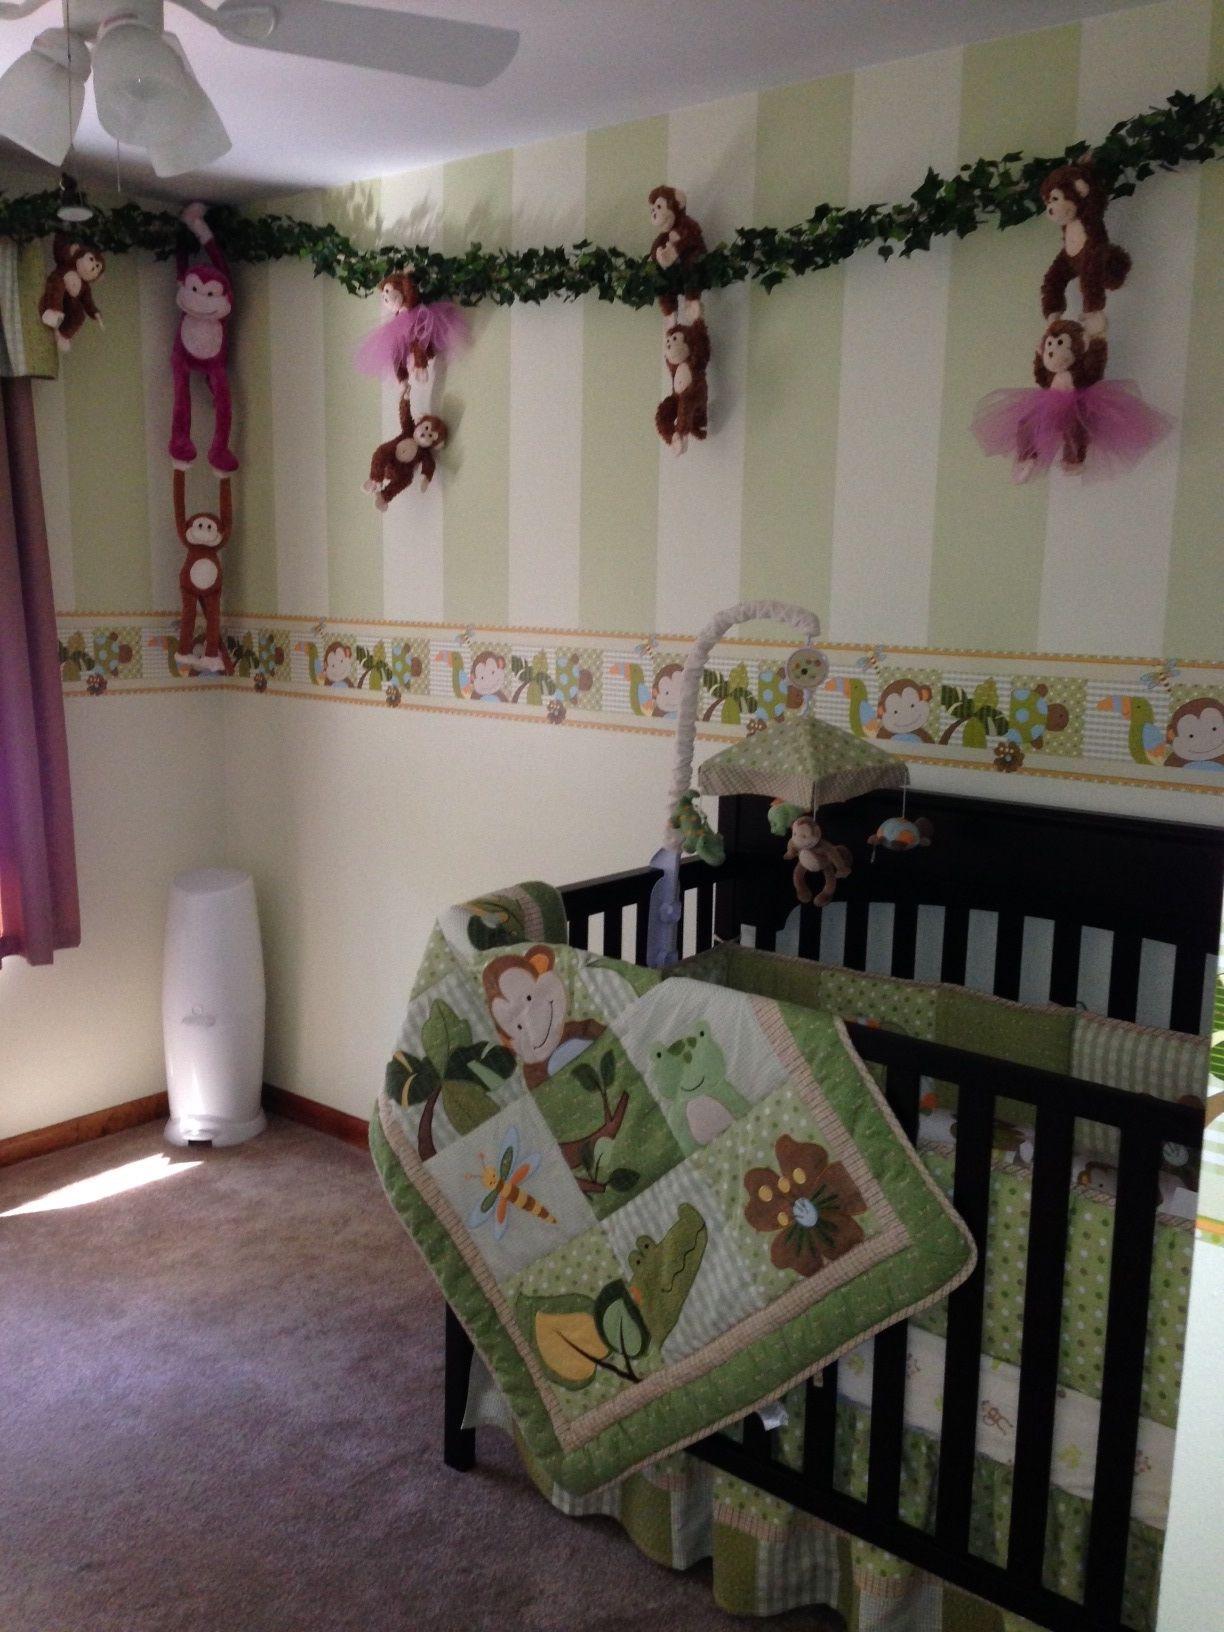 Cool Baby Boy Nursery Ideas: Twin Boy And Girl Monkey Themed Nursery